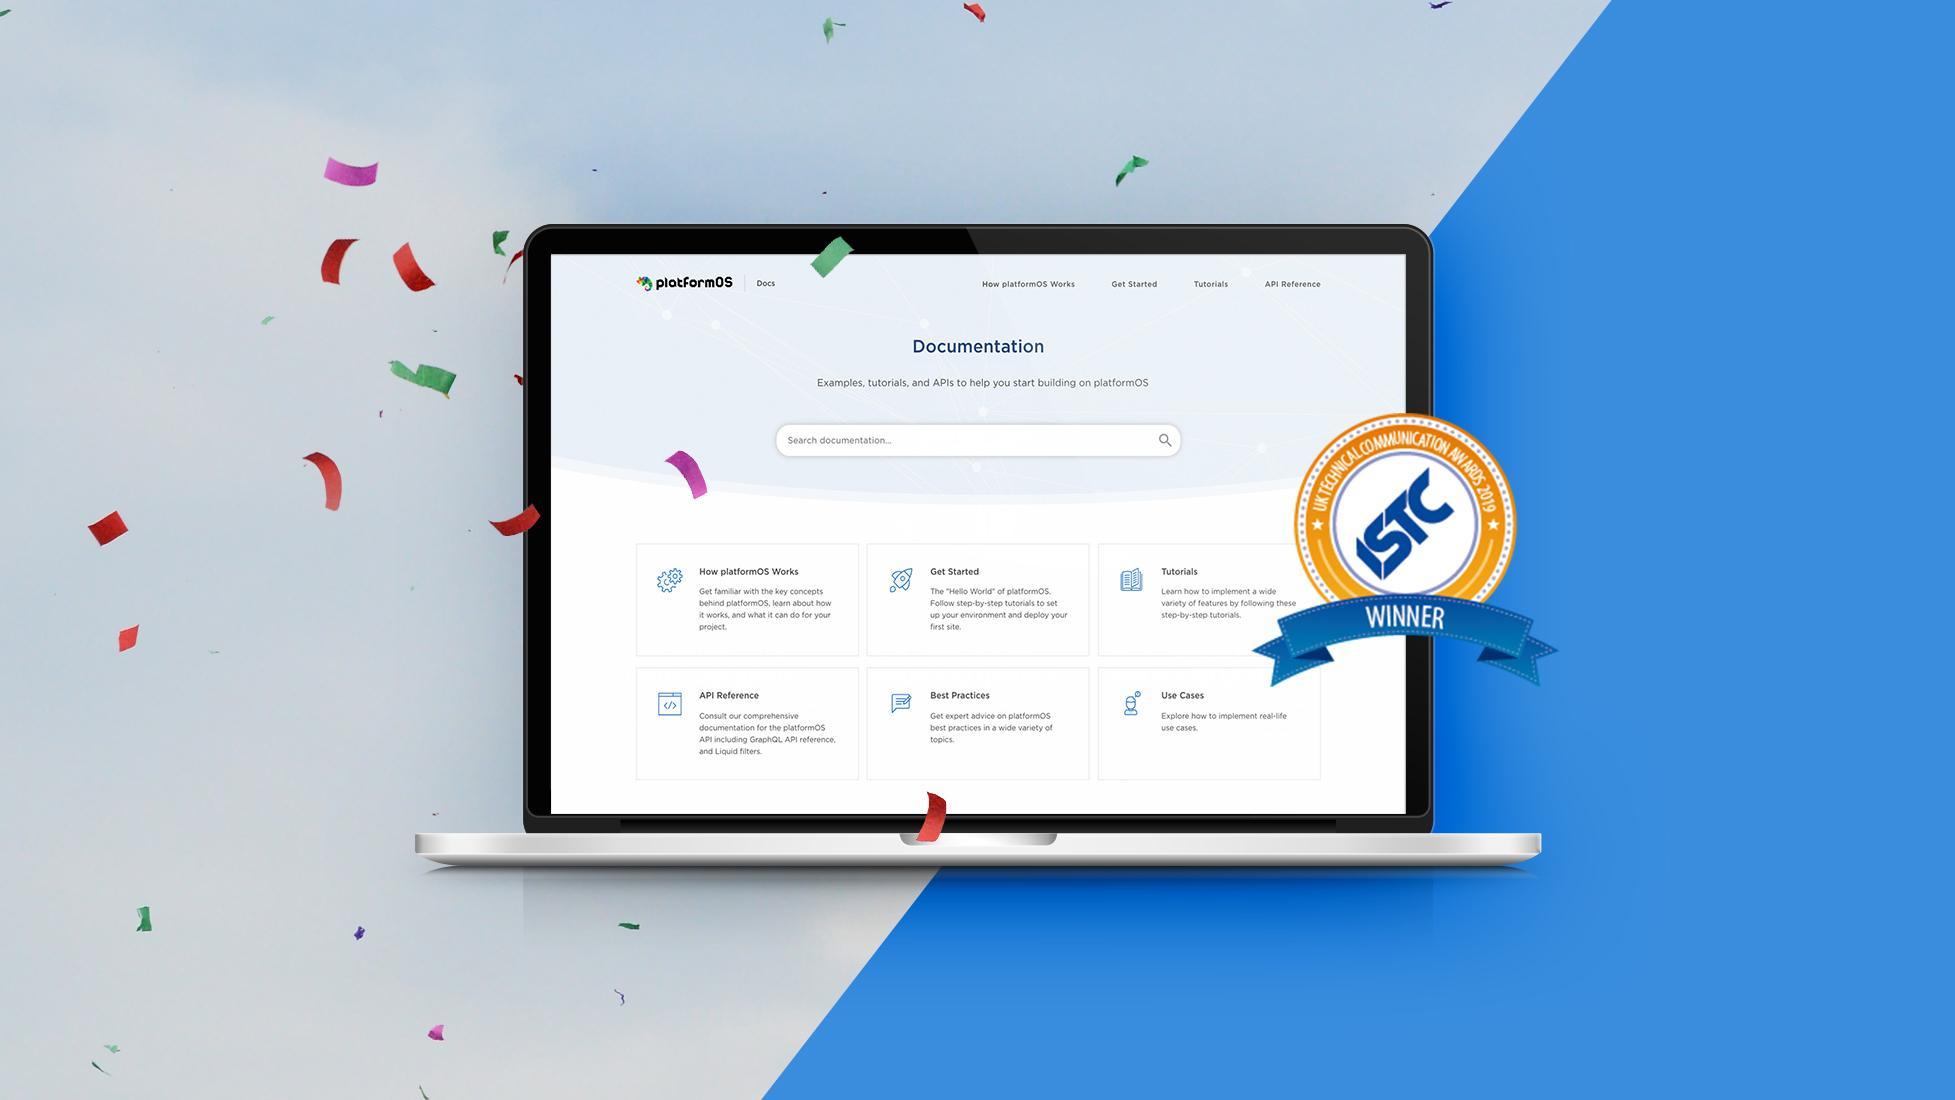 platformOS Developer Portal Wins UK Technical Communication Award